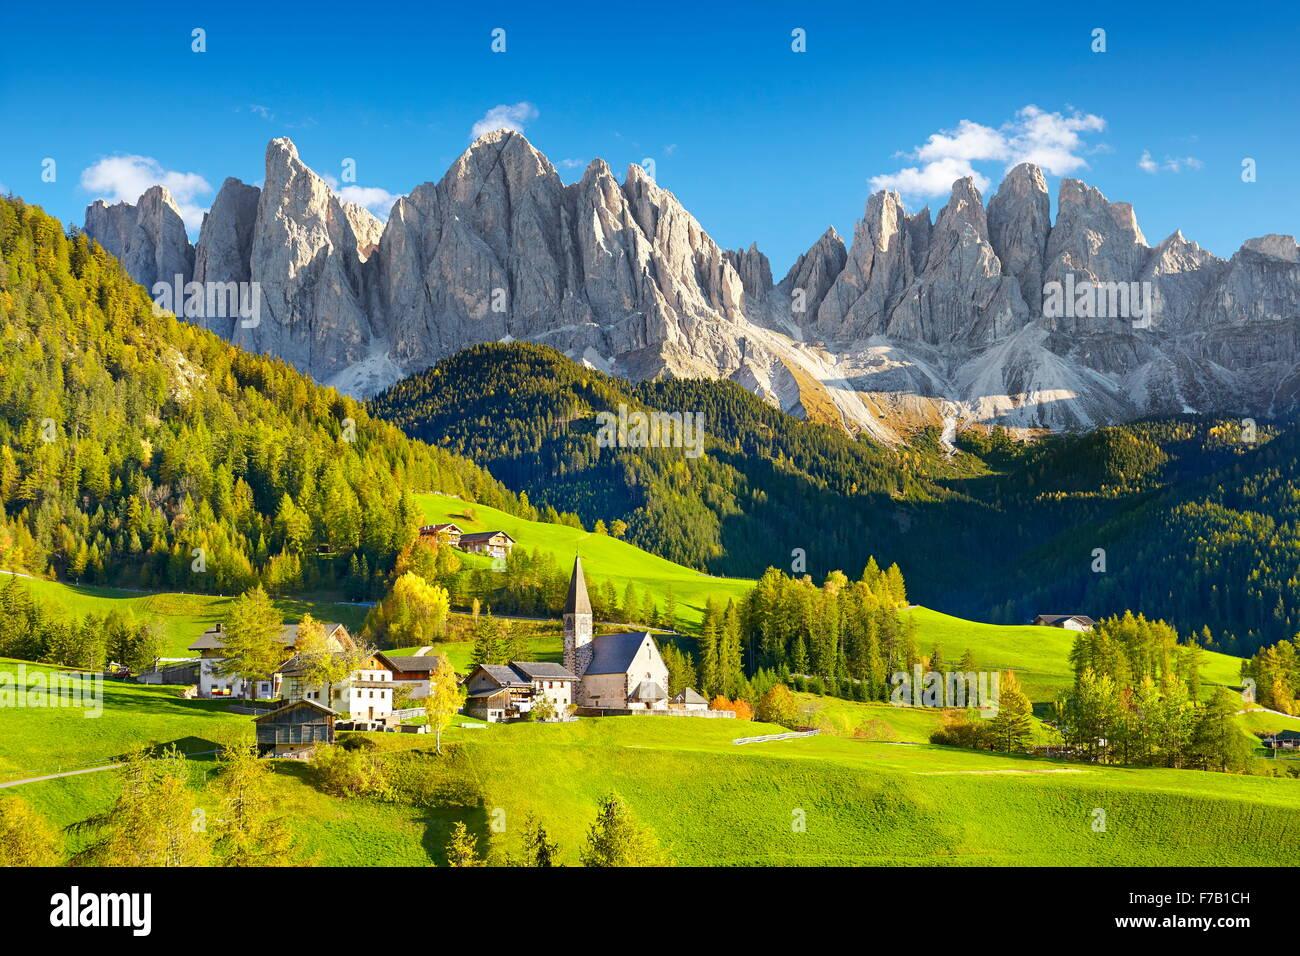 Puez Odle Parco naturale Dolomiti, montagne, Alpi europee, Alto Adige, Italia Immagini Stock